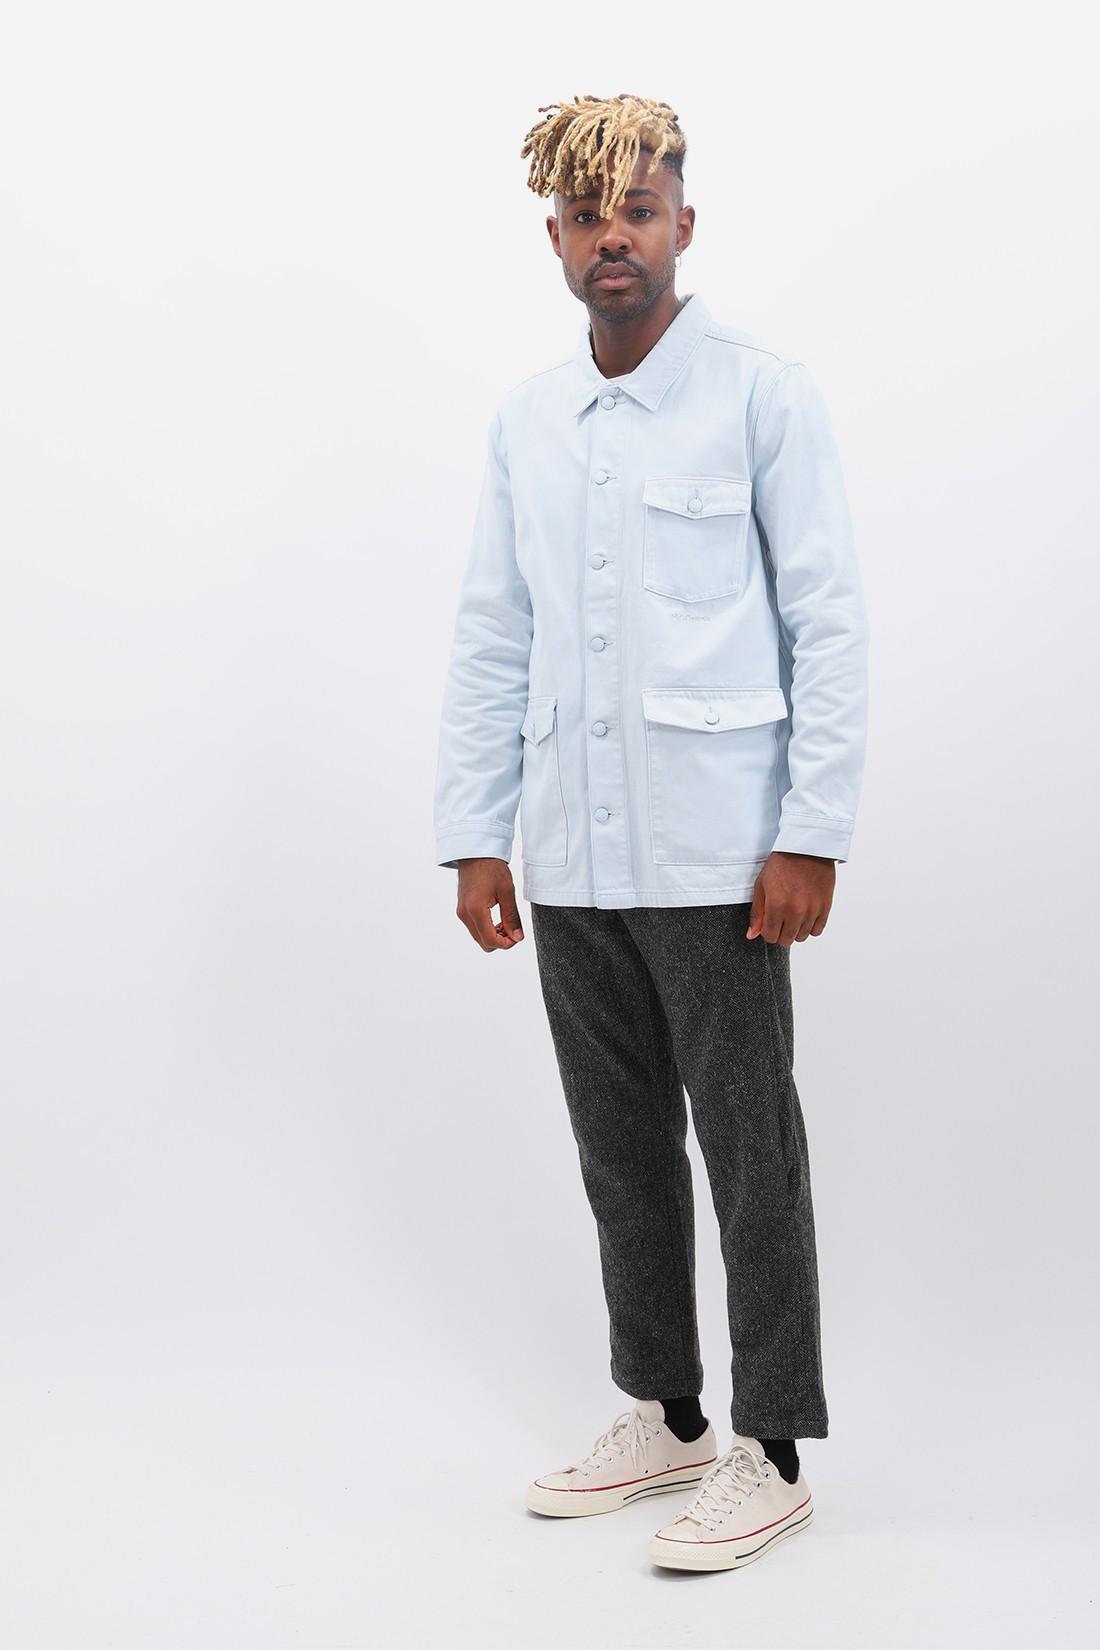 M.C.OVERALLS / Denim work jacket Illusion blue